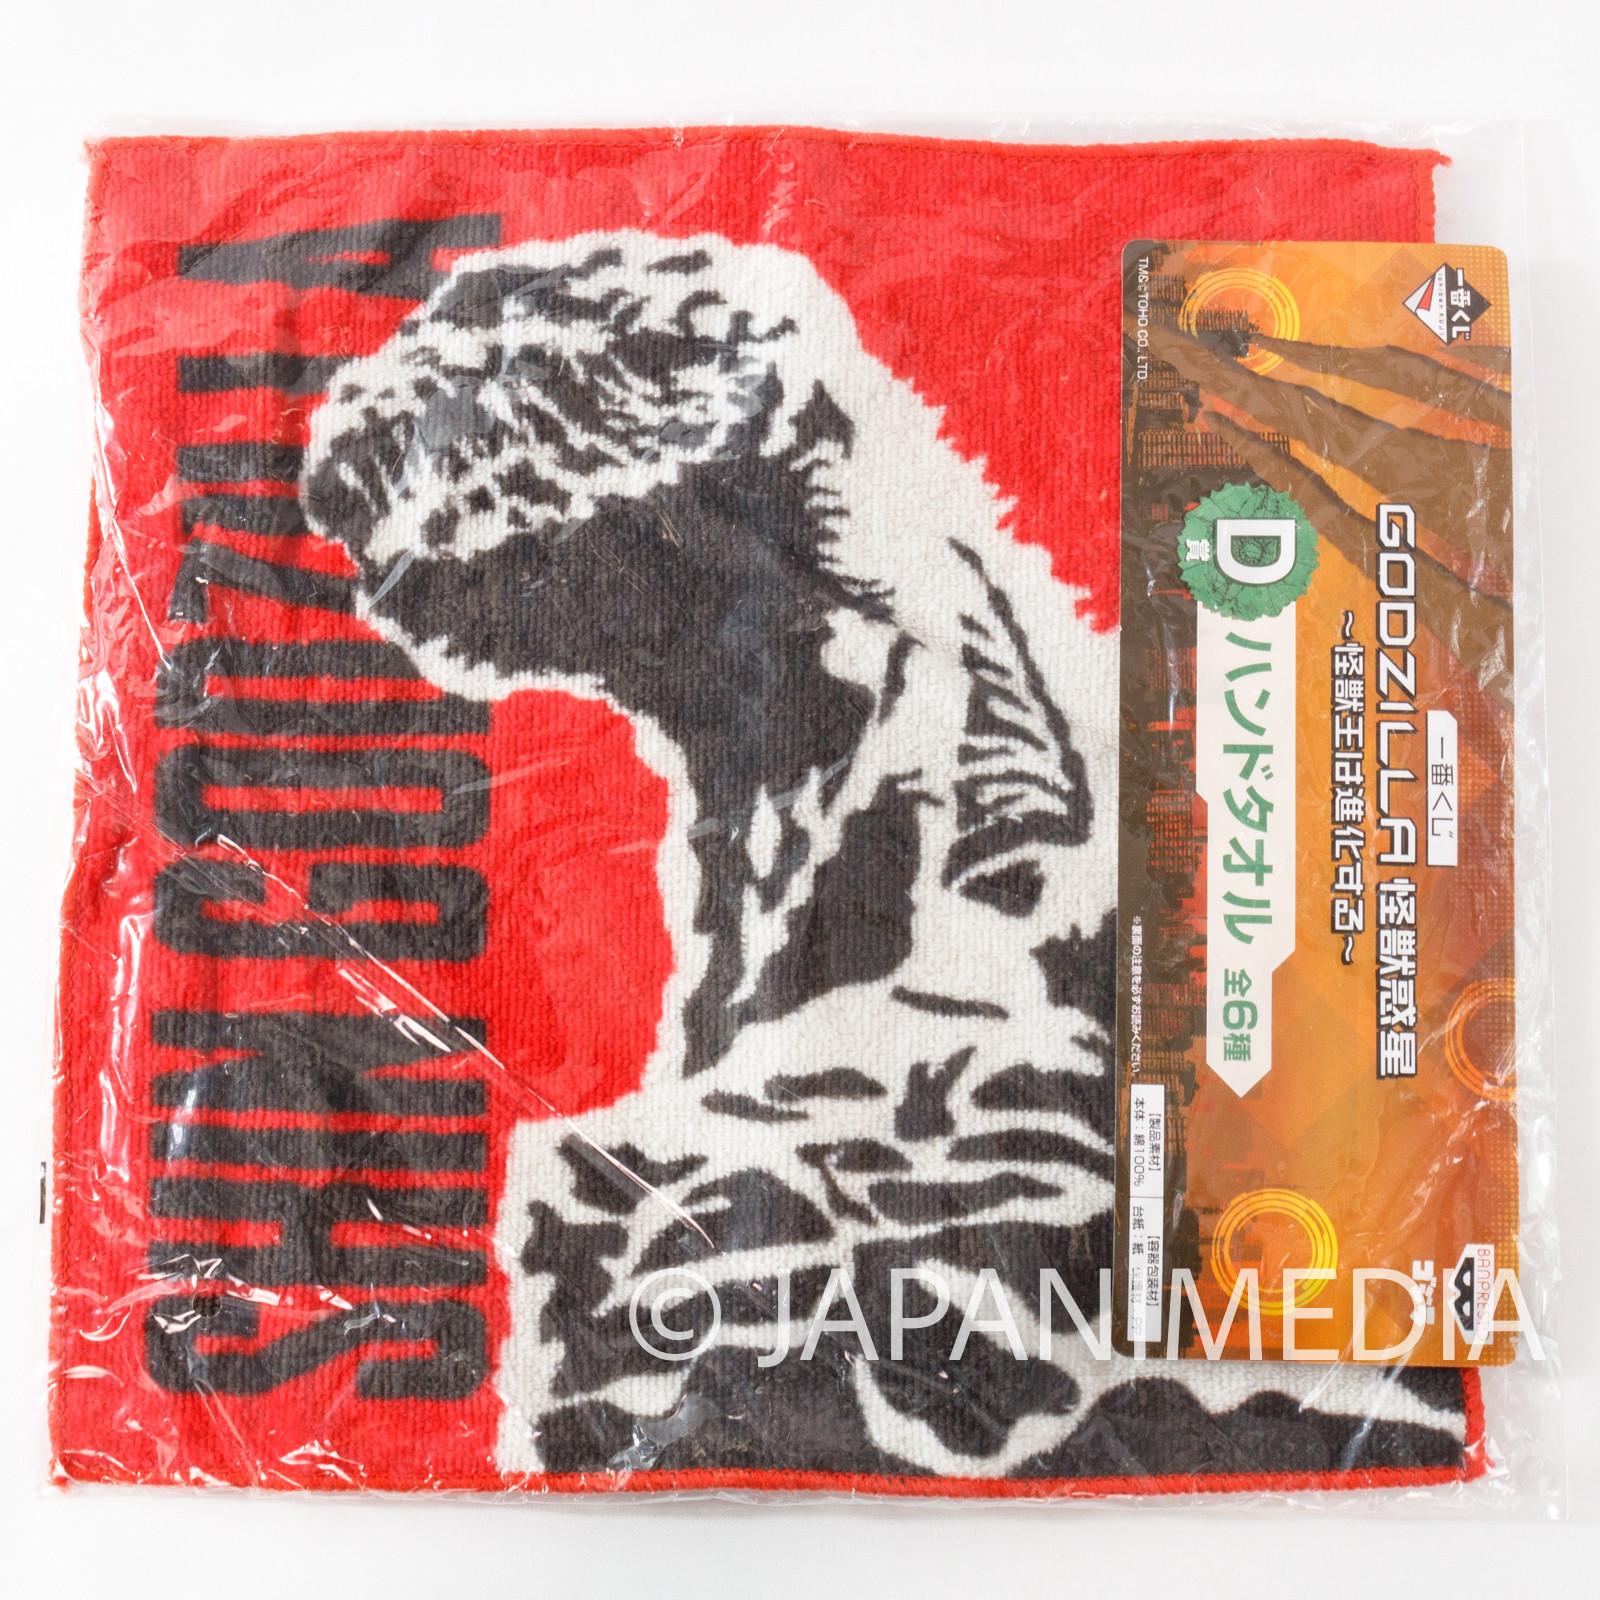 Shin Godzilla Hand Towel 9.75x9.75 inch Banpresto JAPAN TOKUSATSU